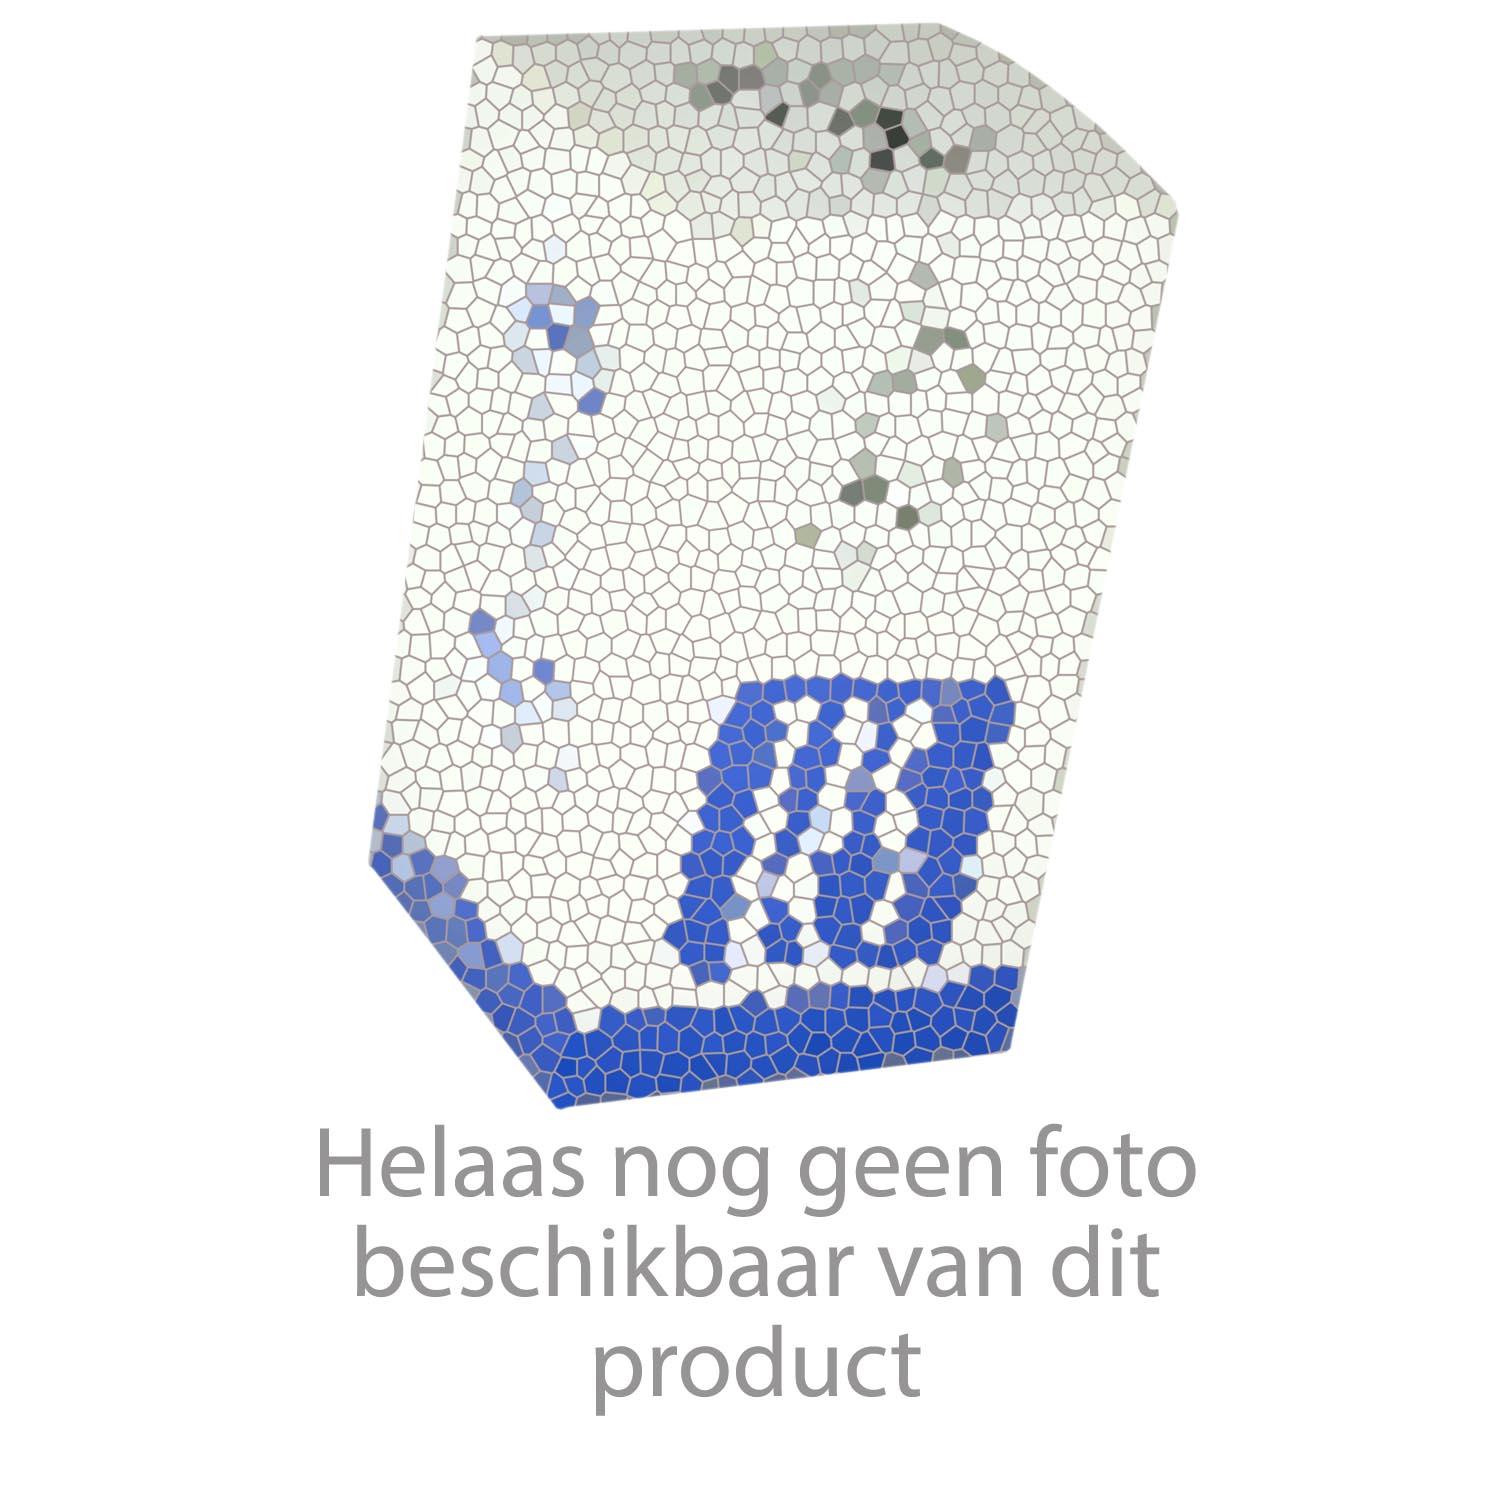 Hansa Onderdelen HANSACOBRA Zelfsluitende Wastafelkraan Lage druk Artikelnummer 9421100